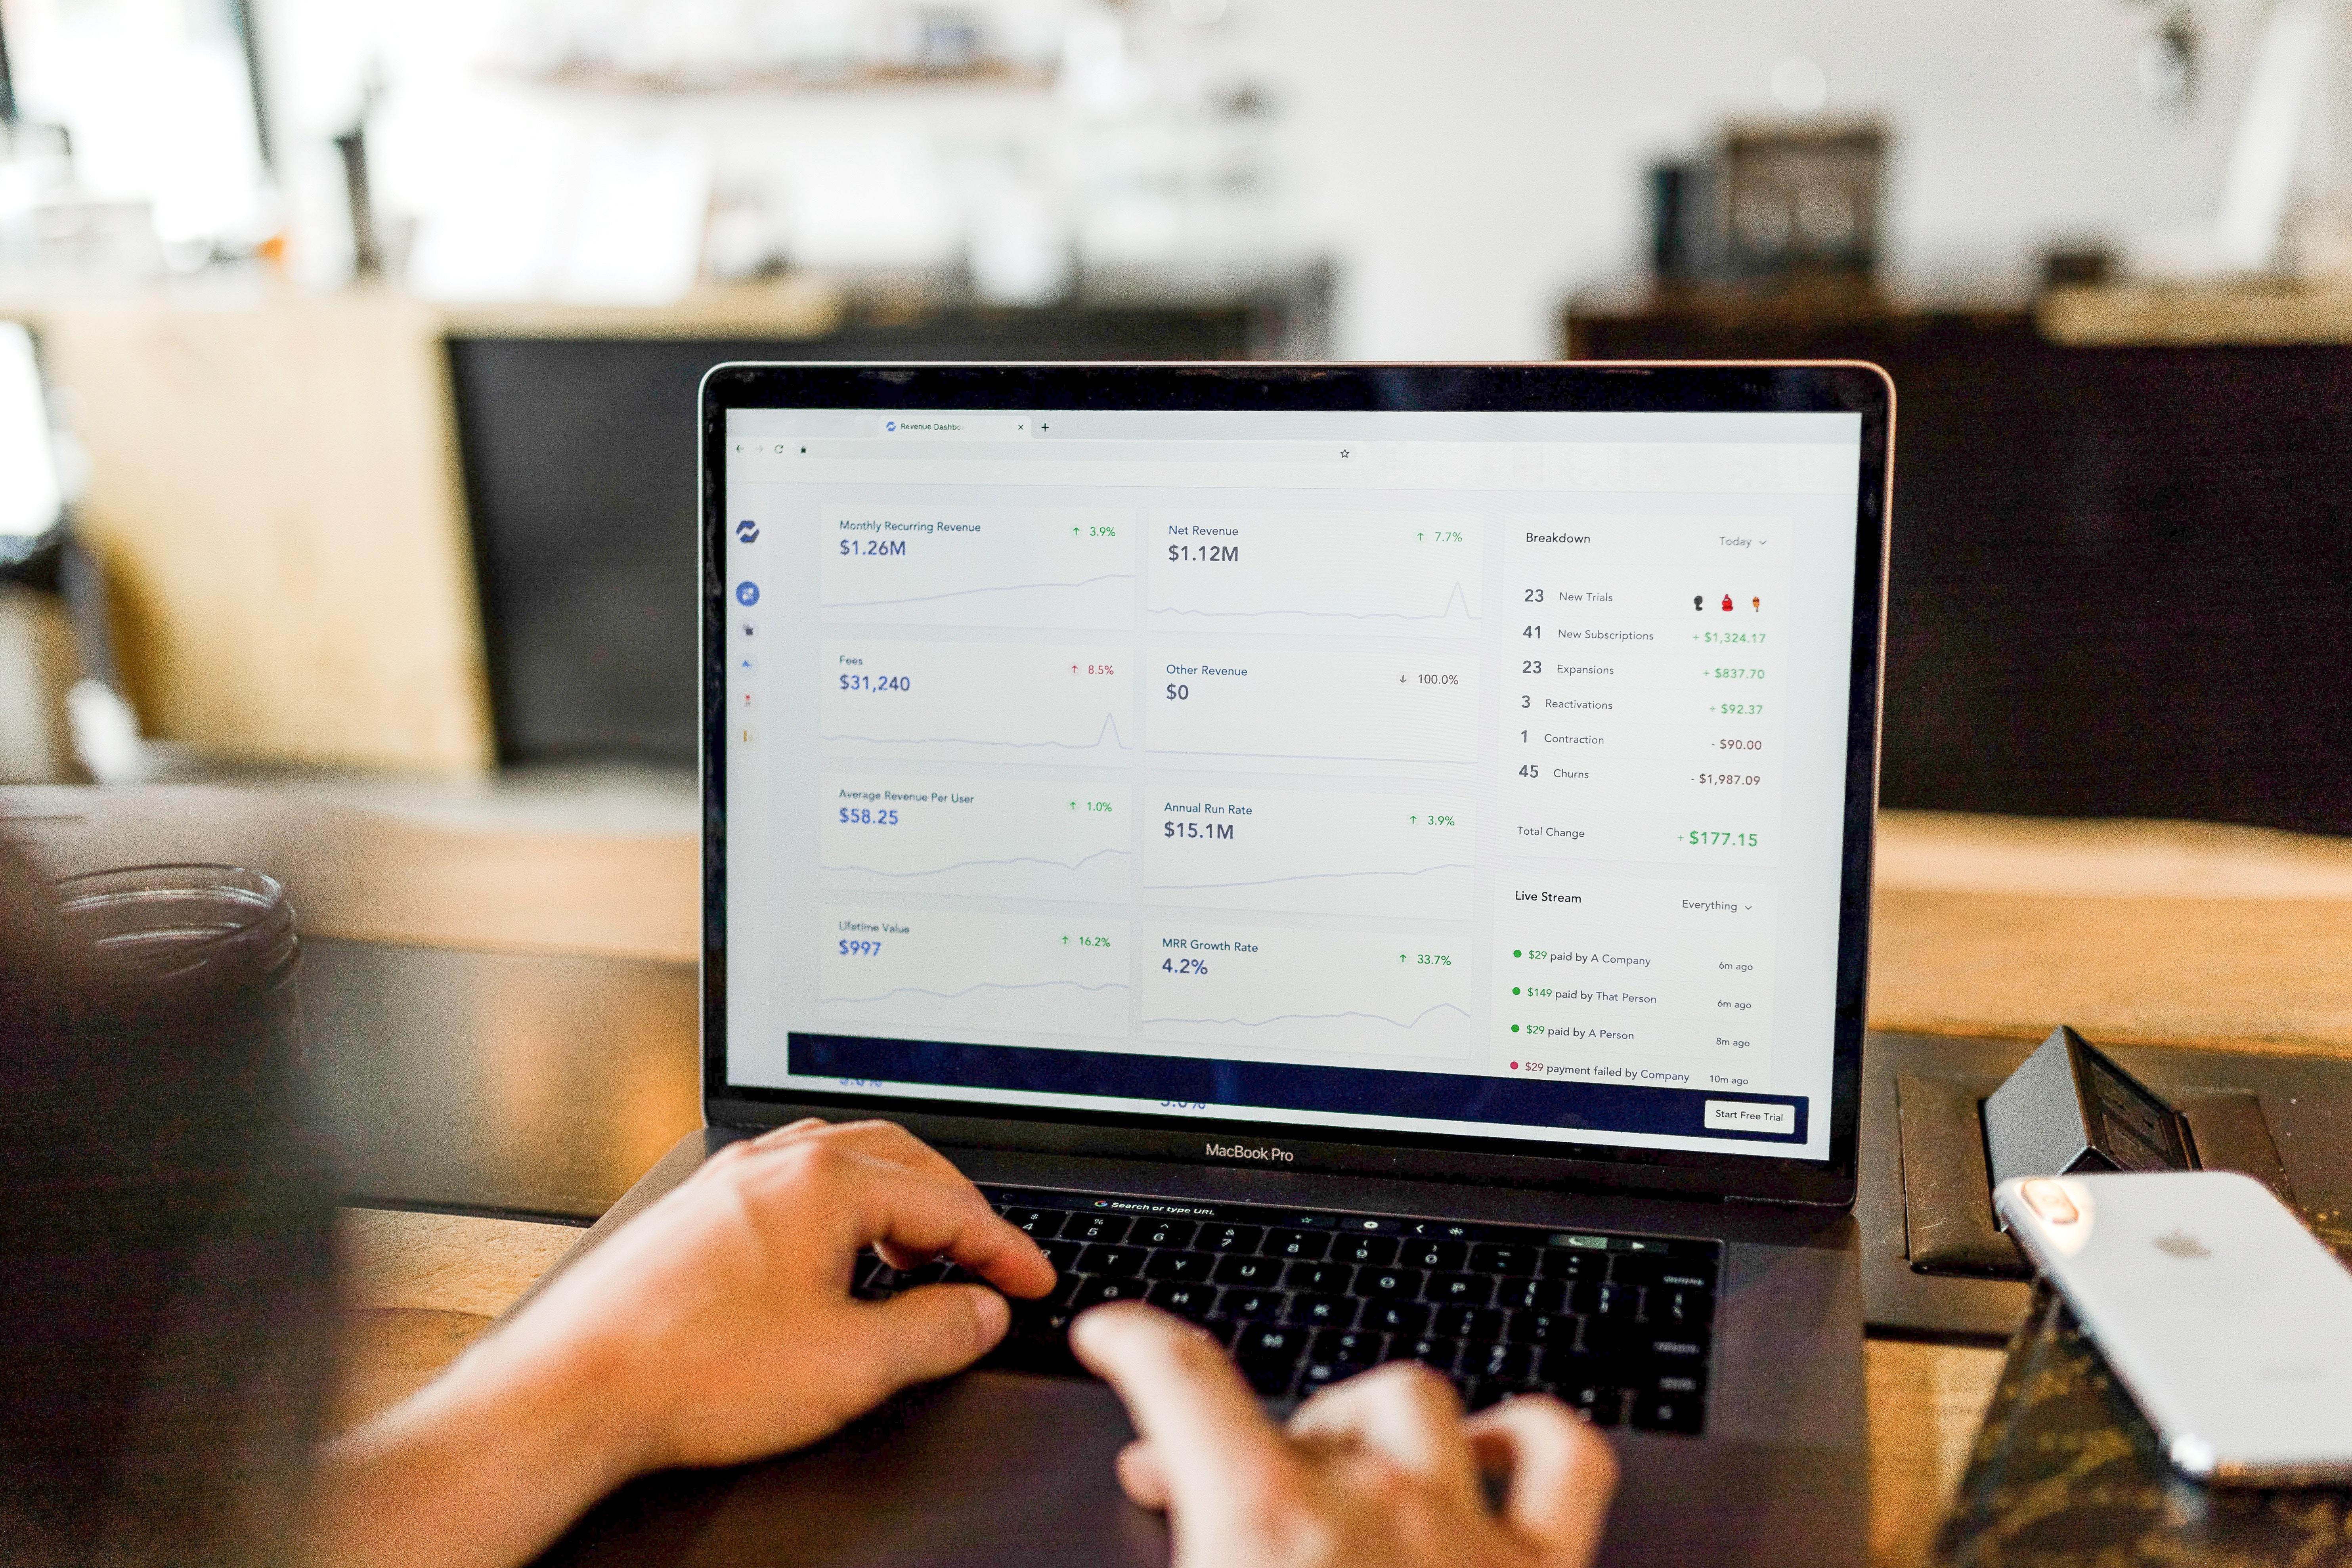 Choosing a Podiatry Billing Service - Billing